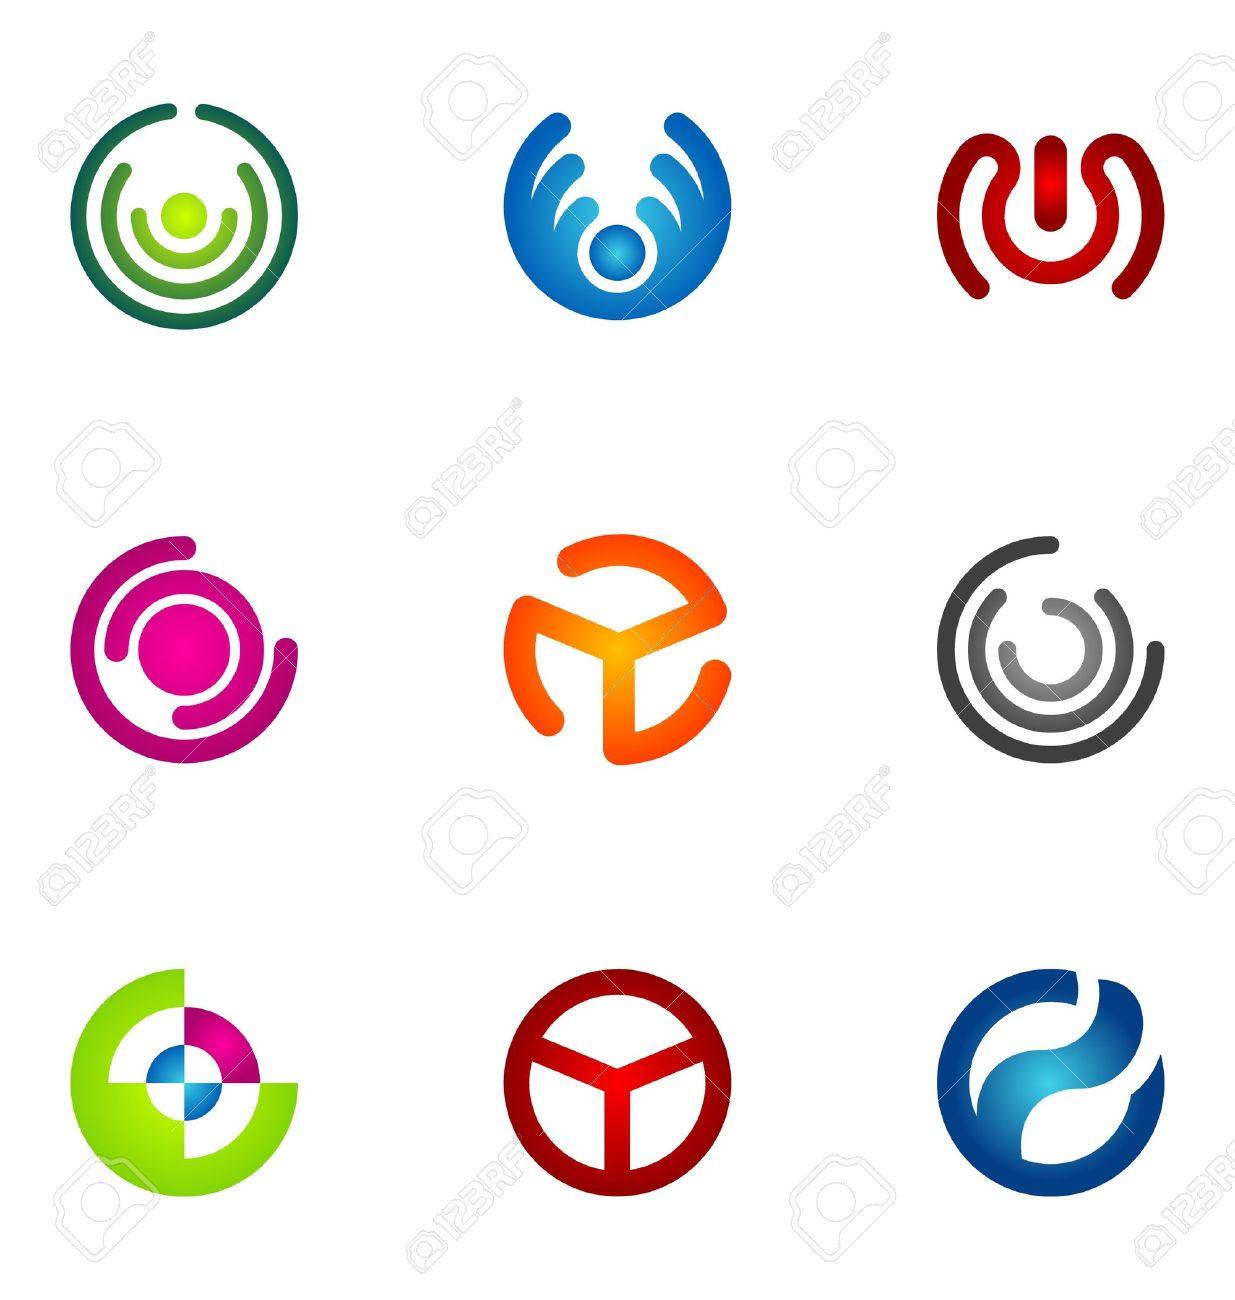 Logo design elements set 53 Stock Vector - 10130269